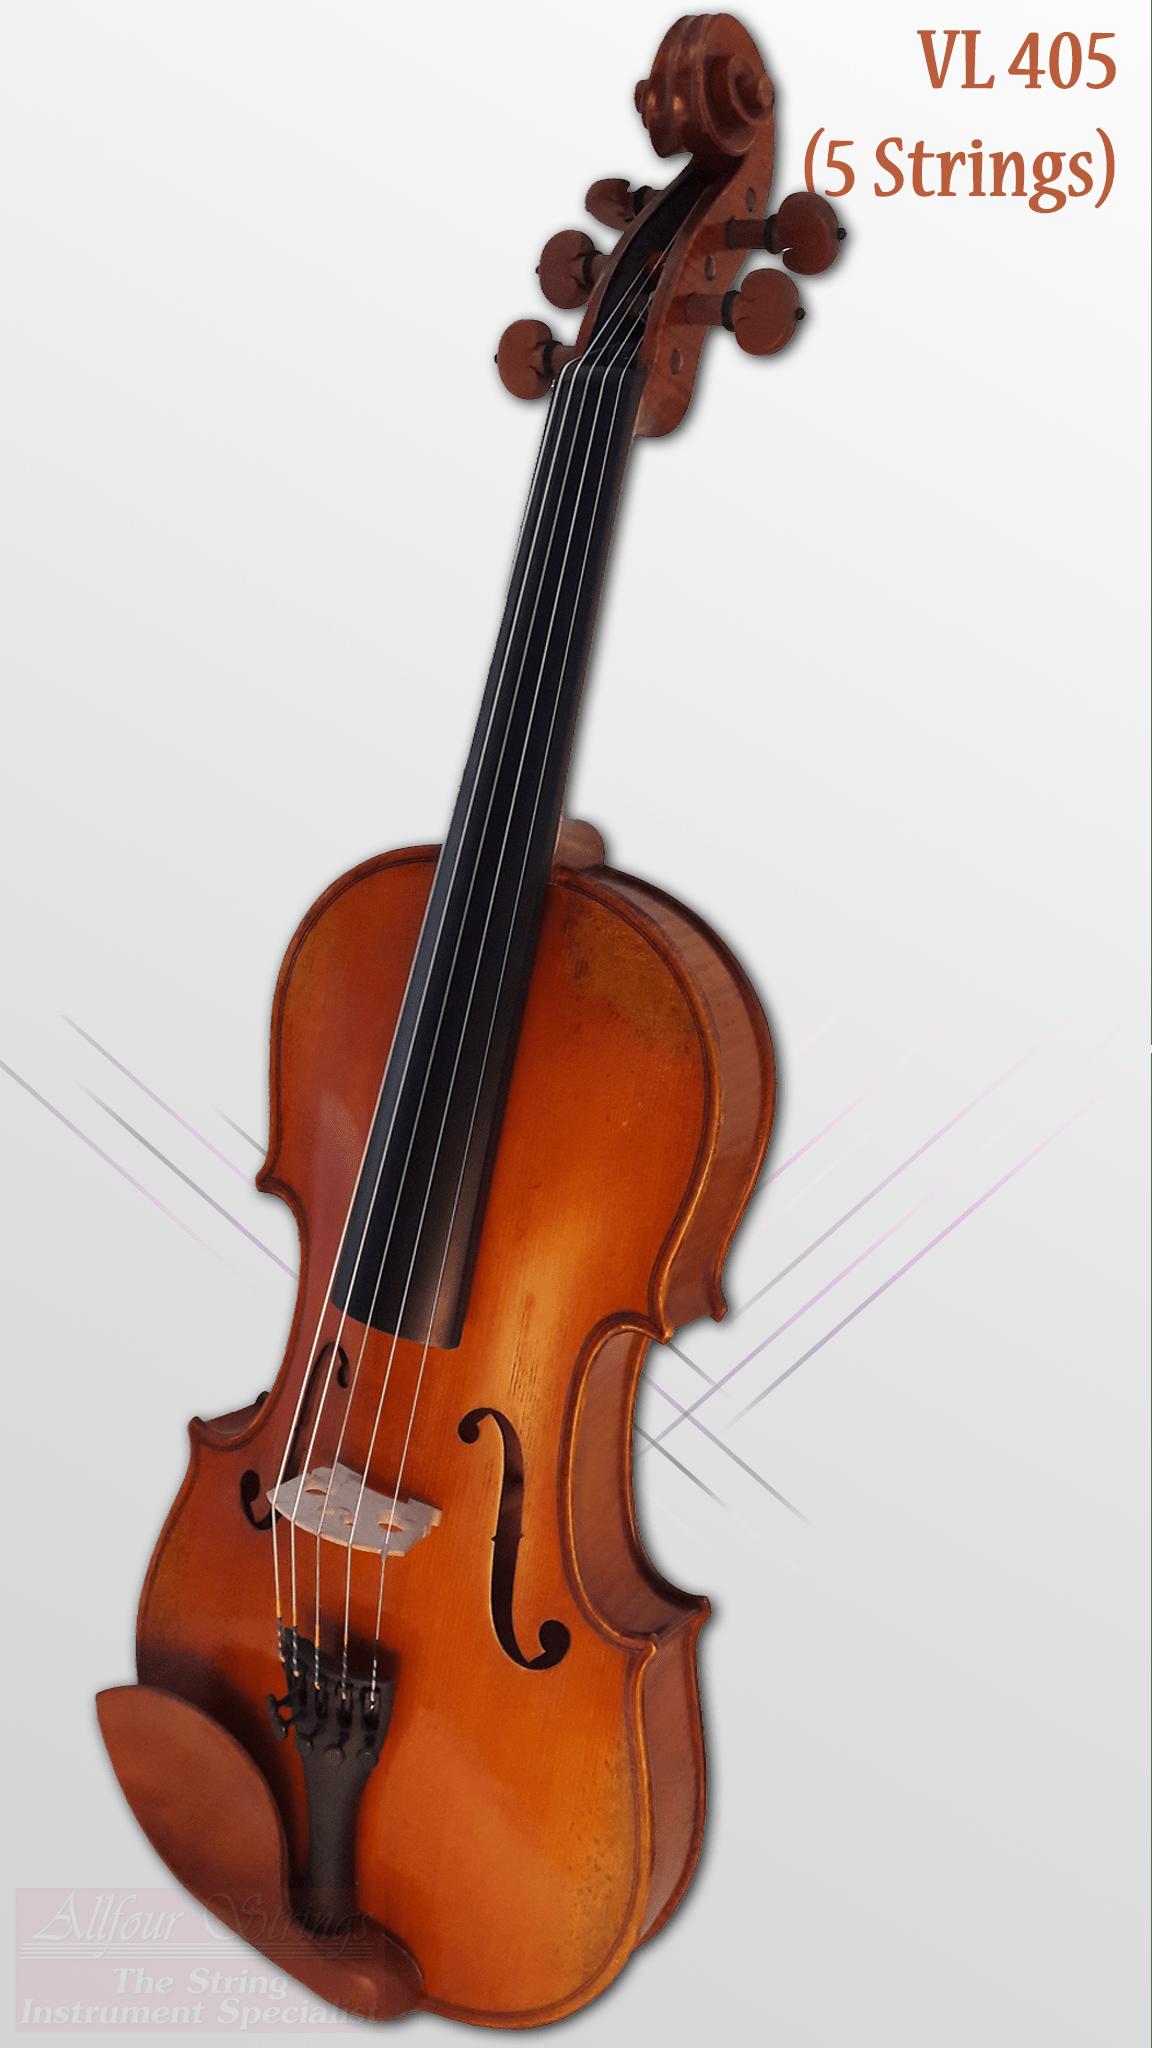 VL-405-5strings-Front-Right-min